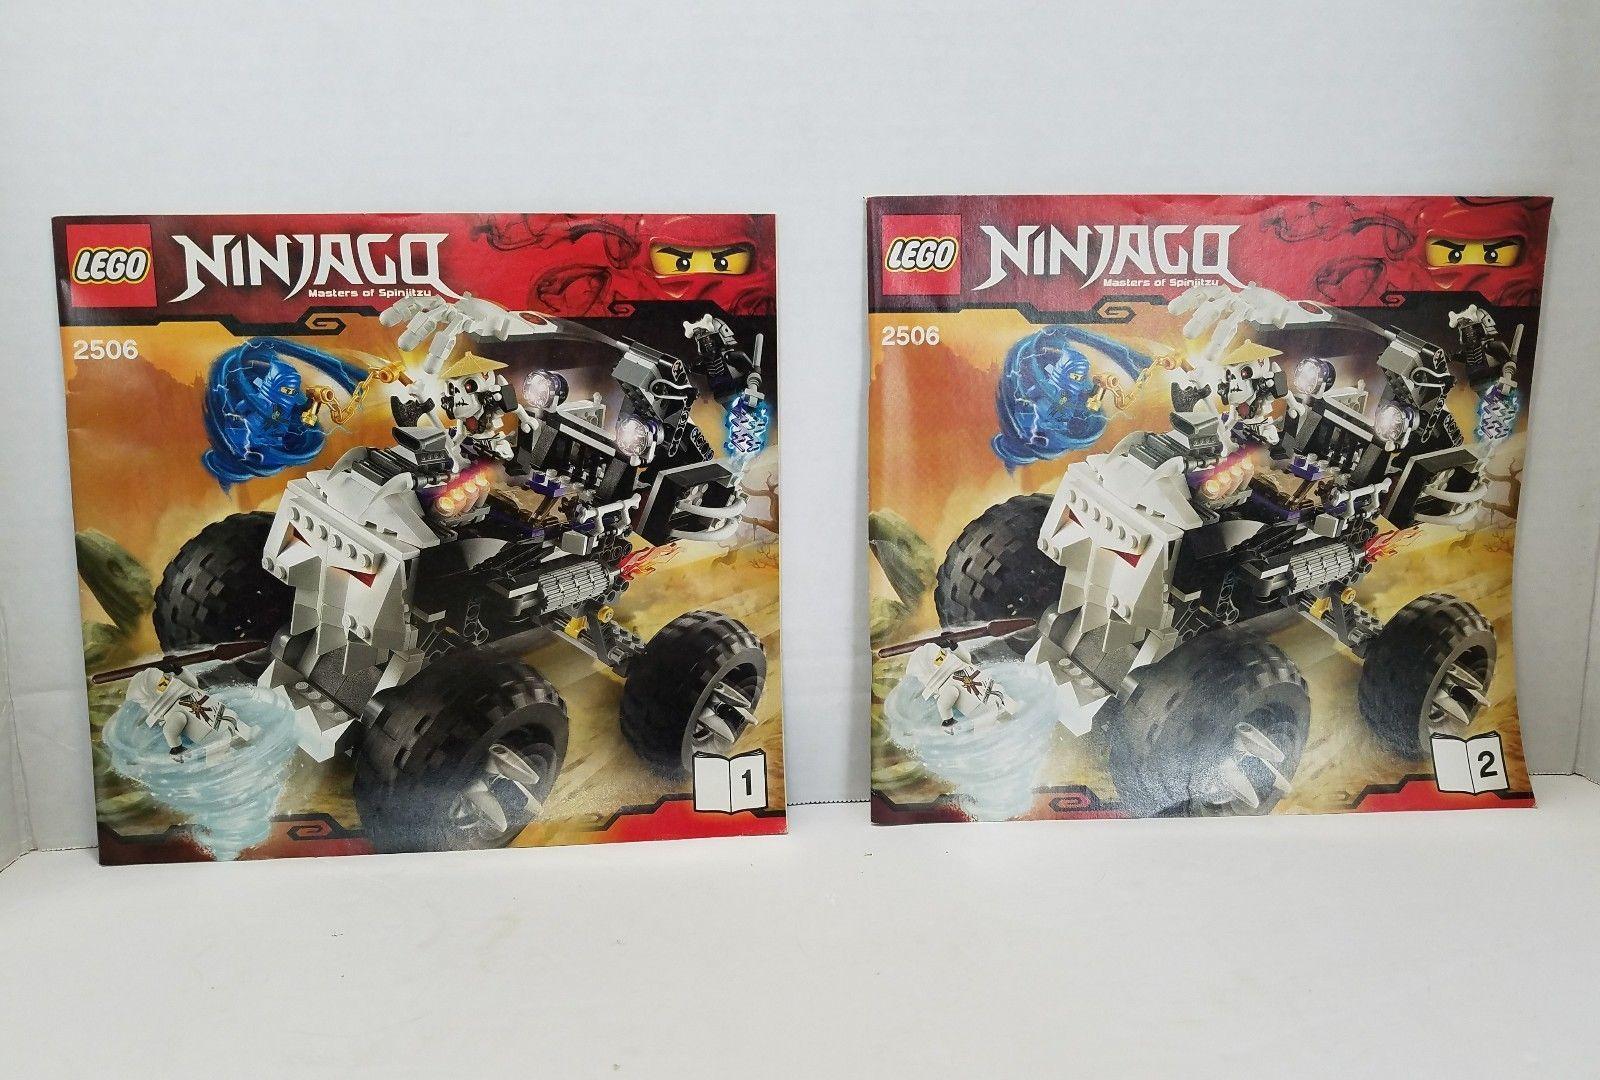 Lego Ninjago Spirits Of Spinjitzu Skull And 16 Similar Items